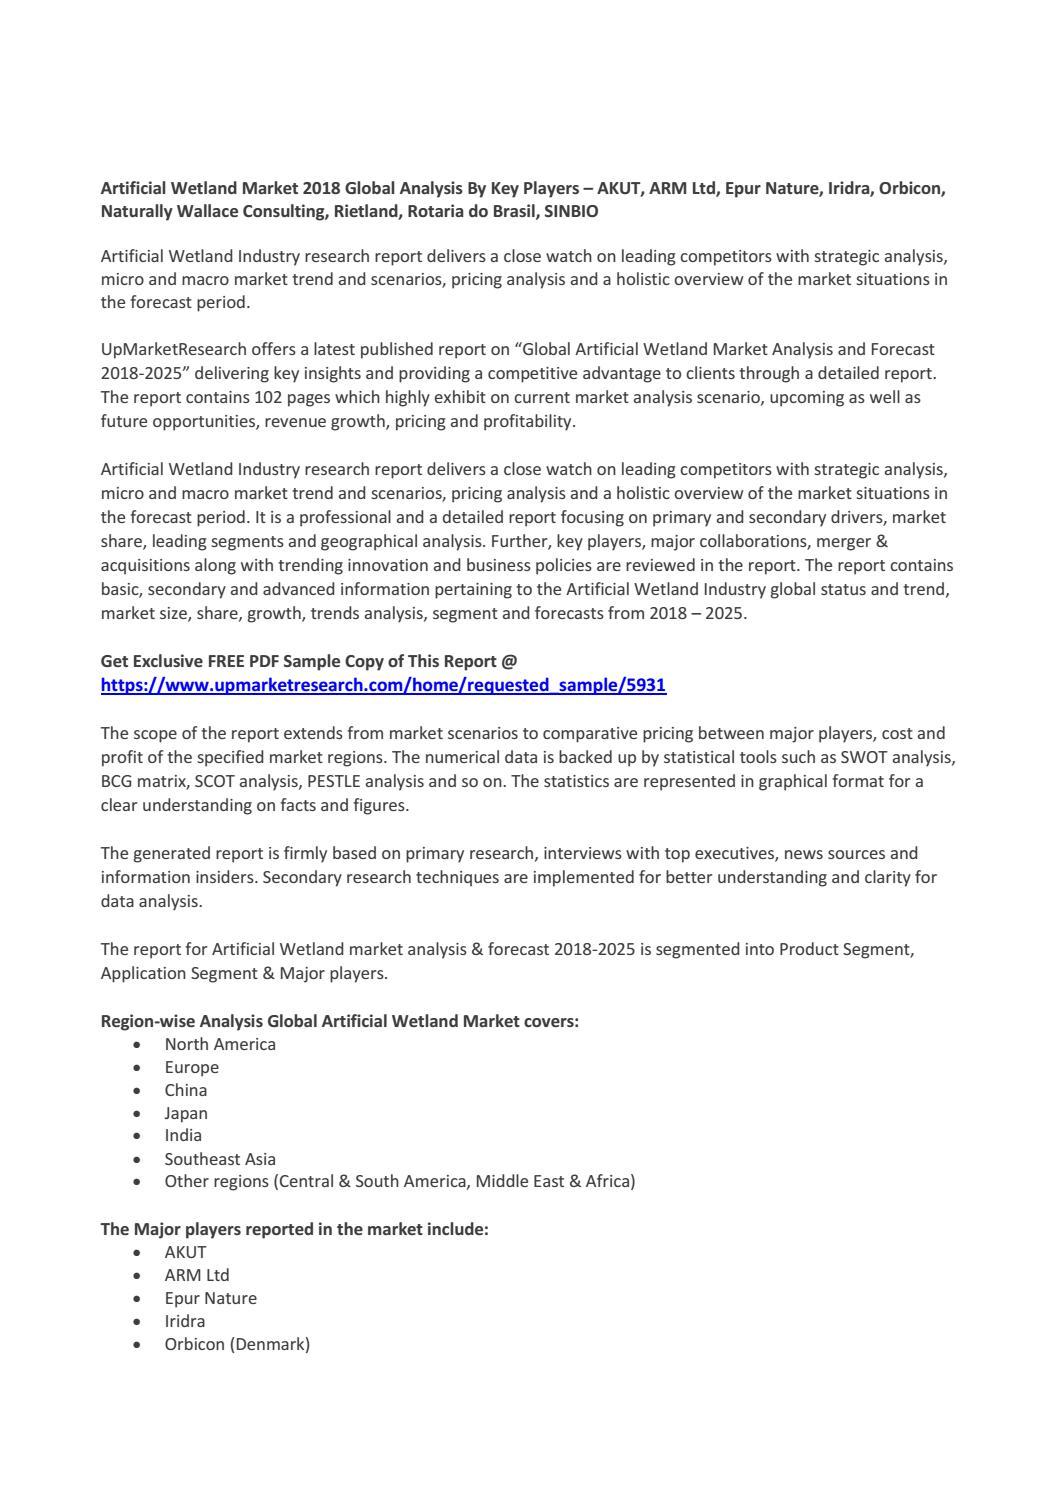 Artificial Wetland Market 2018 Global Analysis By Key